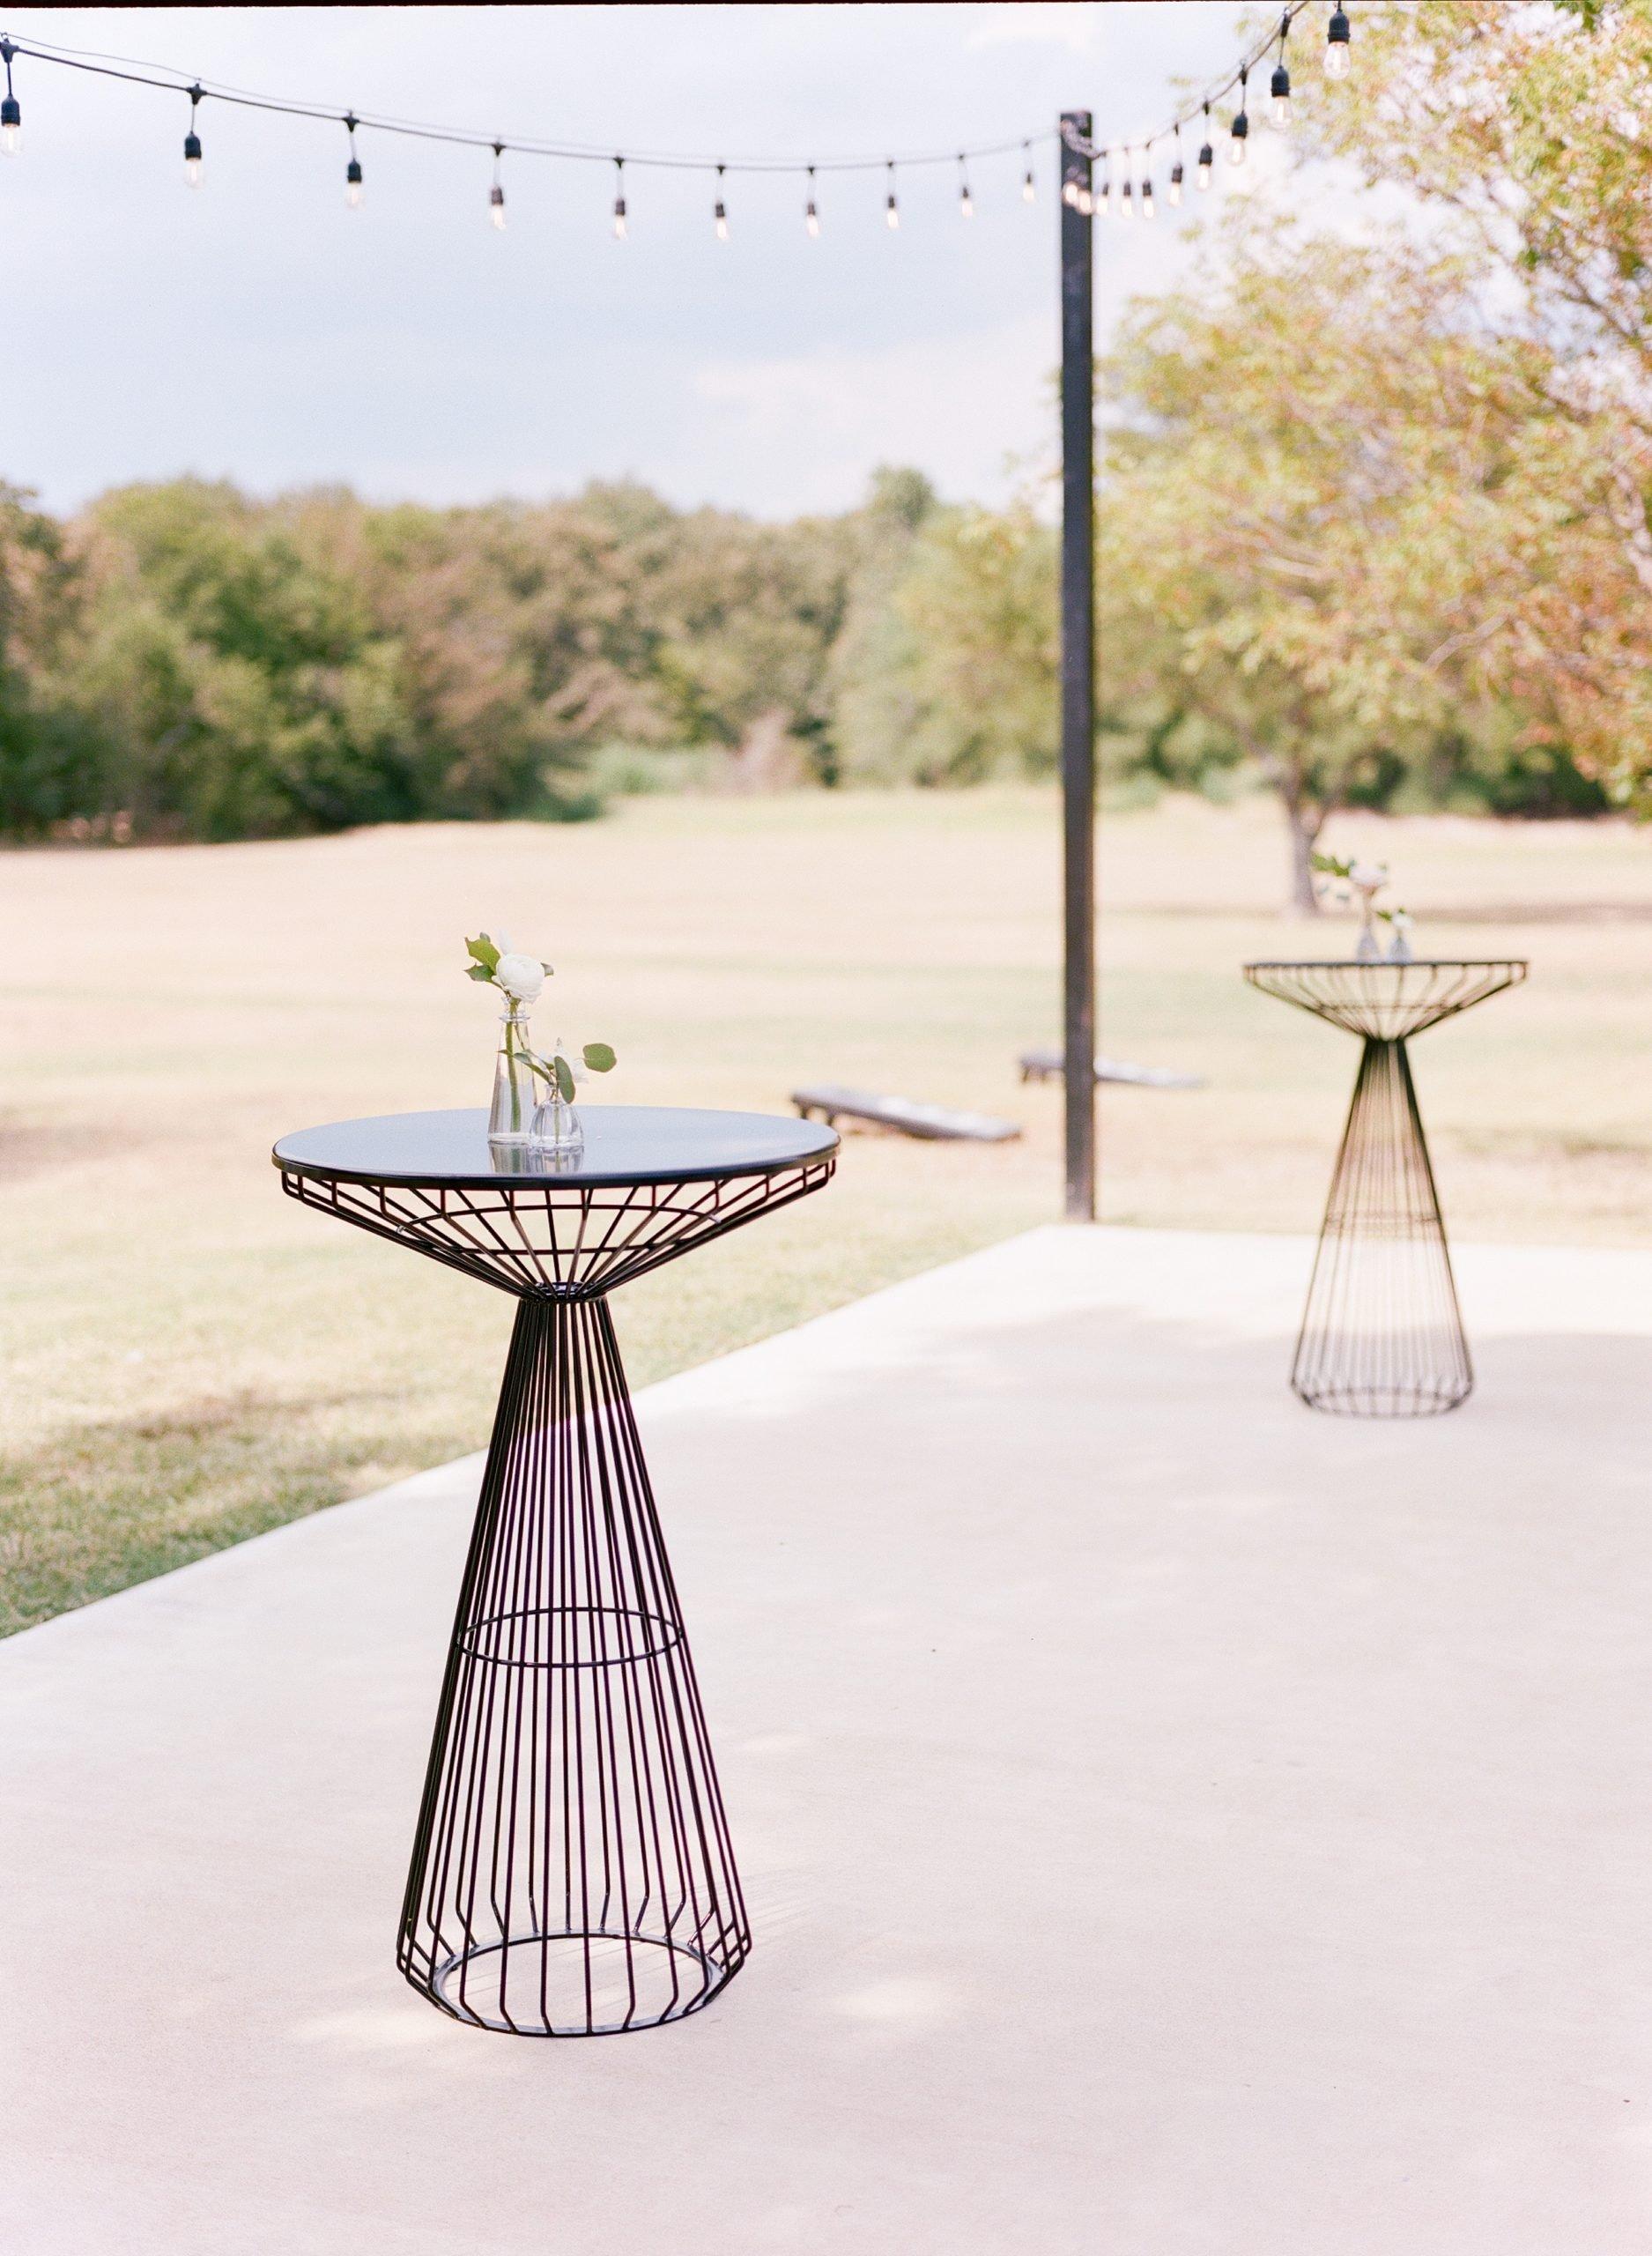 Ben Q Photography - Bride & Groom - Dallas Wedding - The Emerson - Formal Wedding Photo - Modern Wedding - Outdoor Cocktail Hour - Dallas, Texas